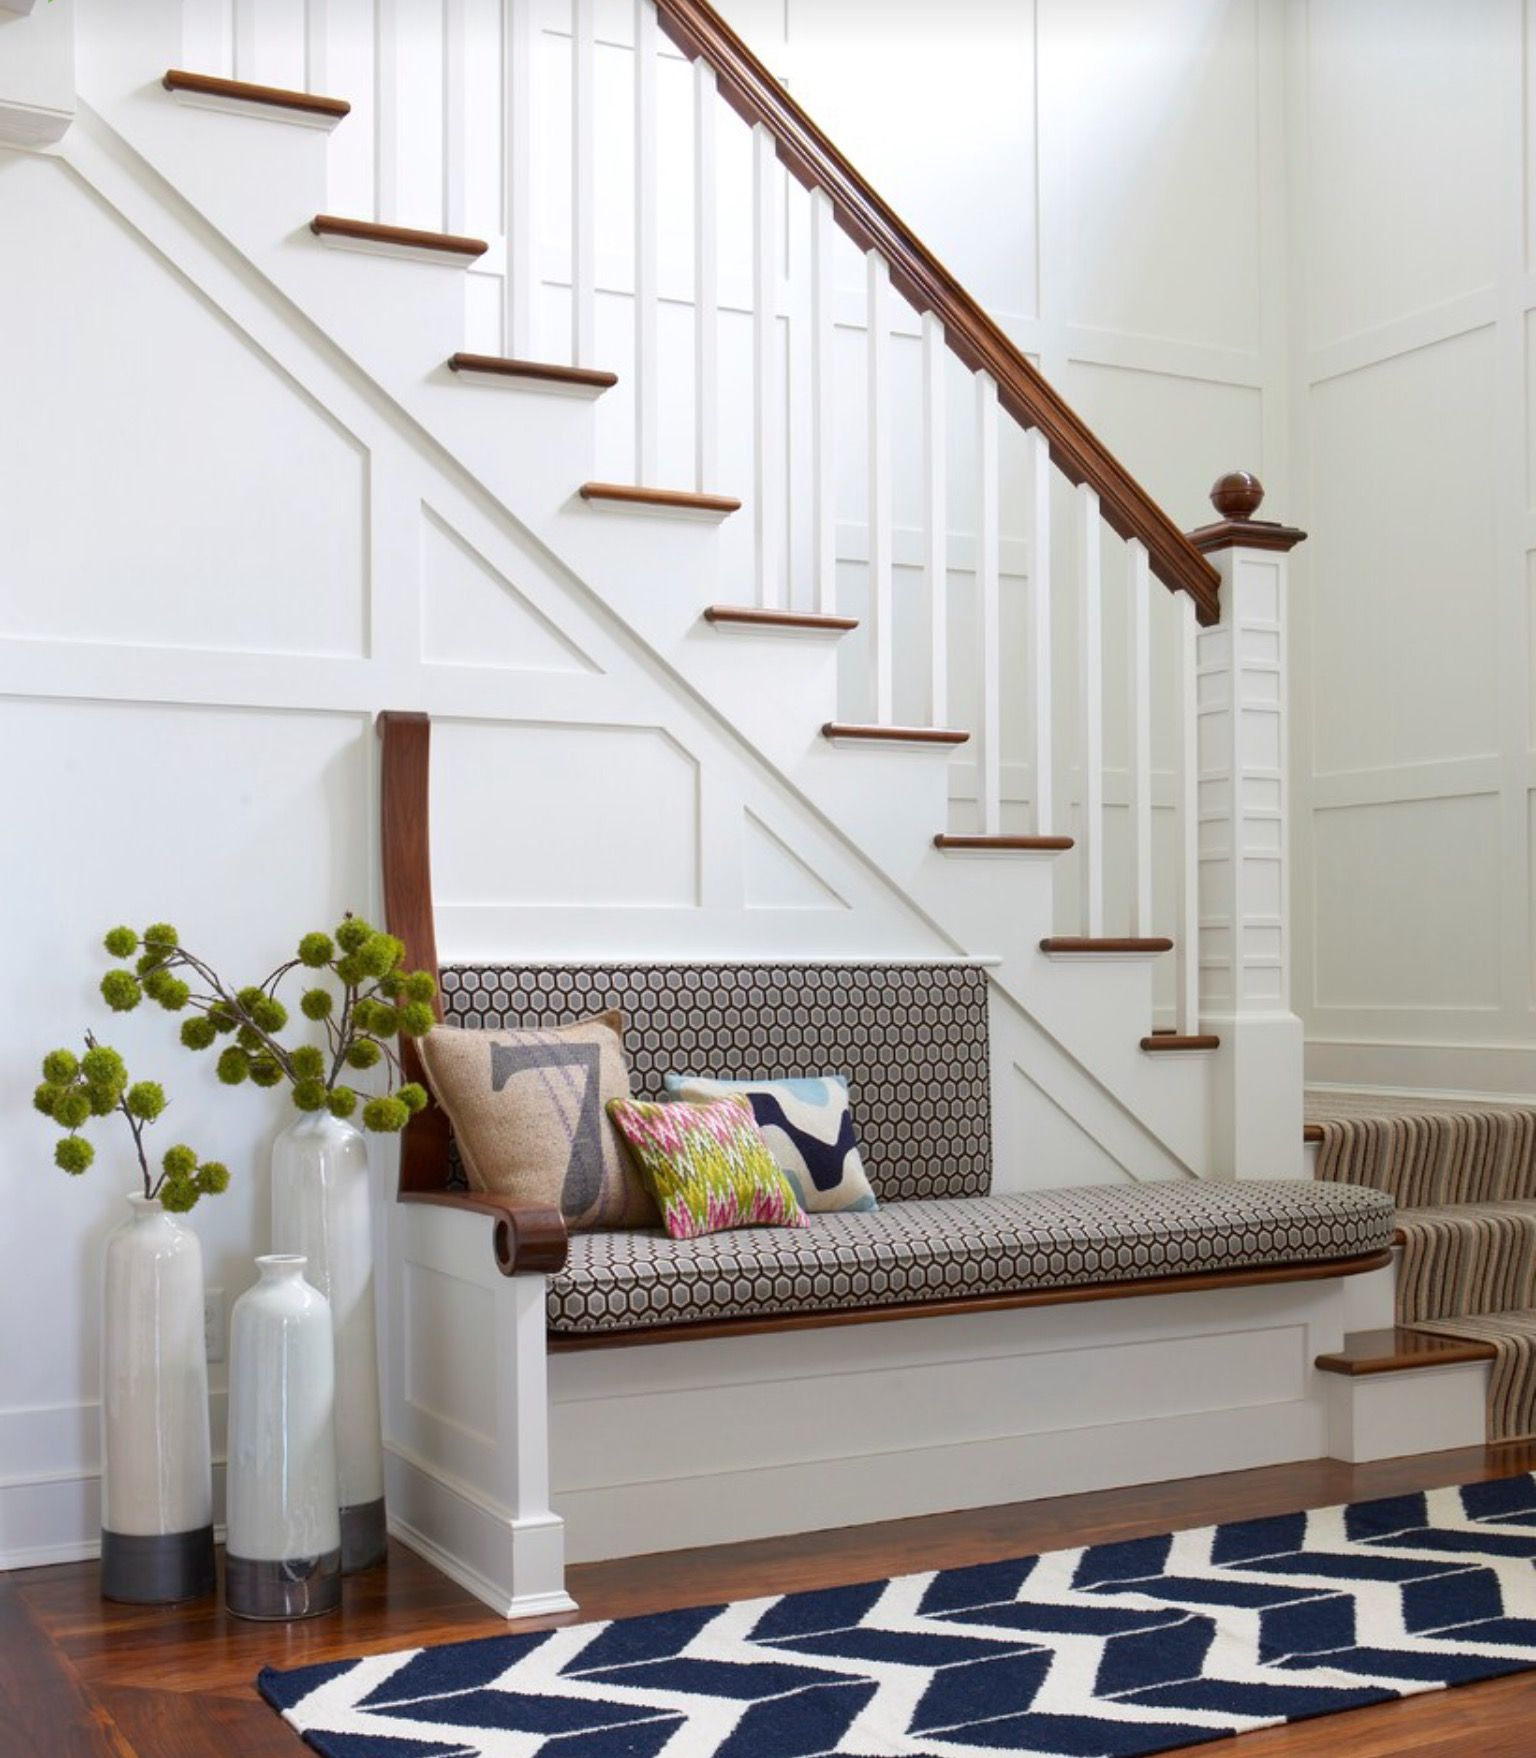 80 Modern Farmhouse Staircase Decor Ideas 64: Idea By Melinda Laudy On New White House